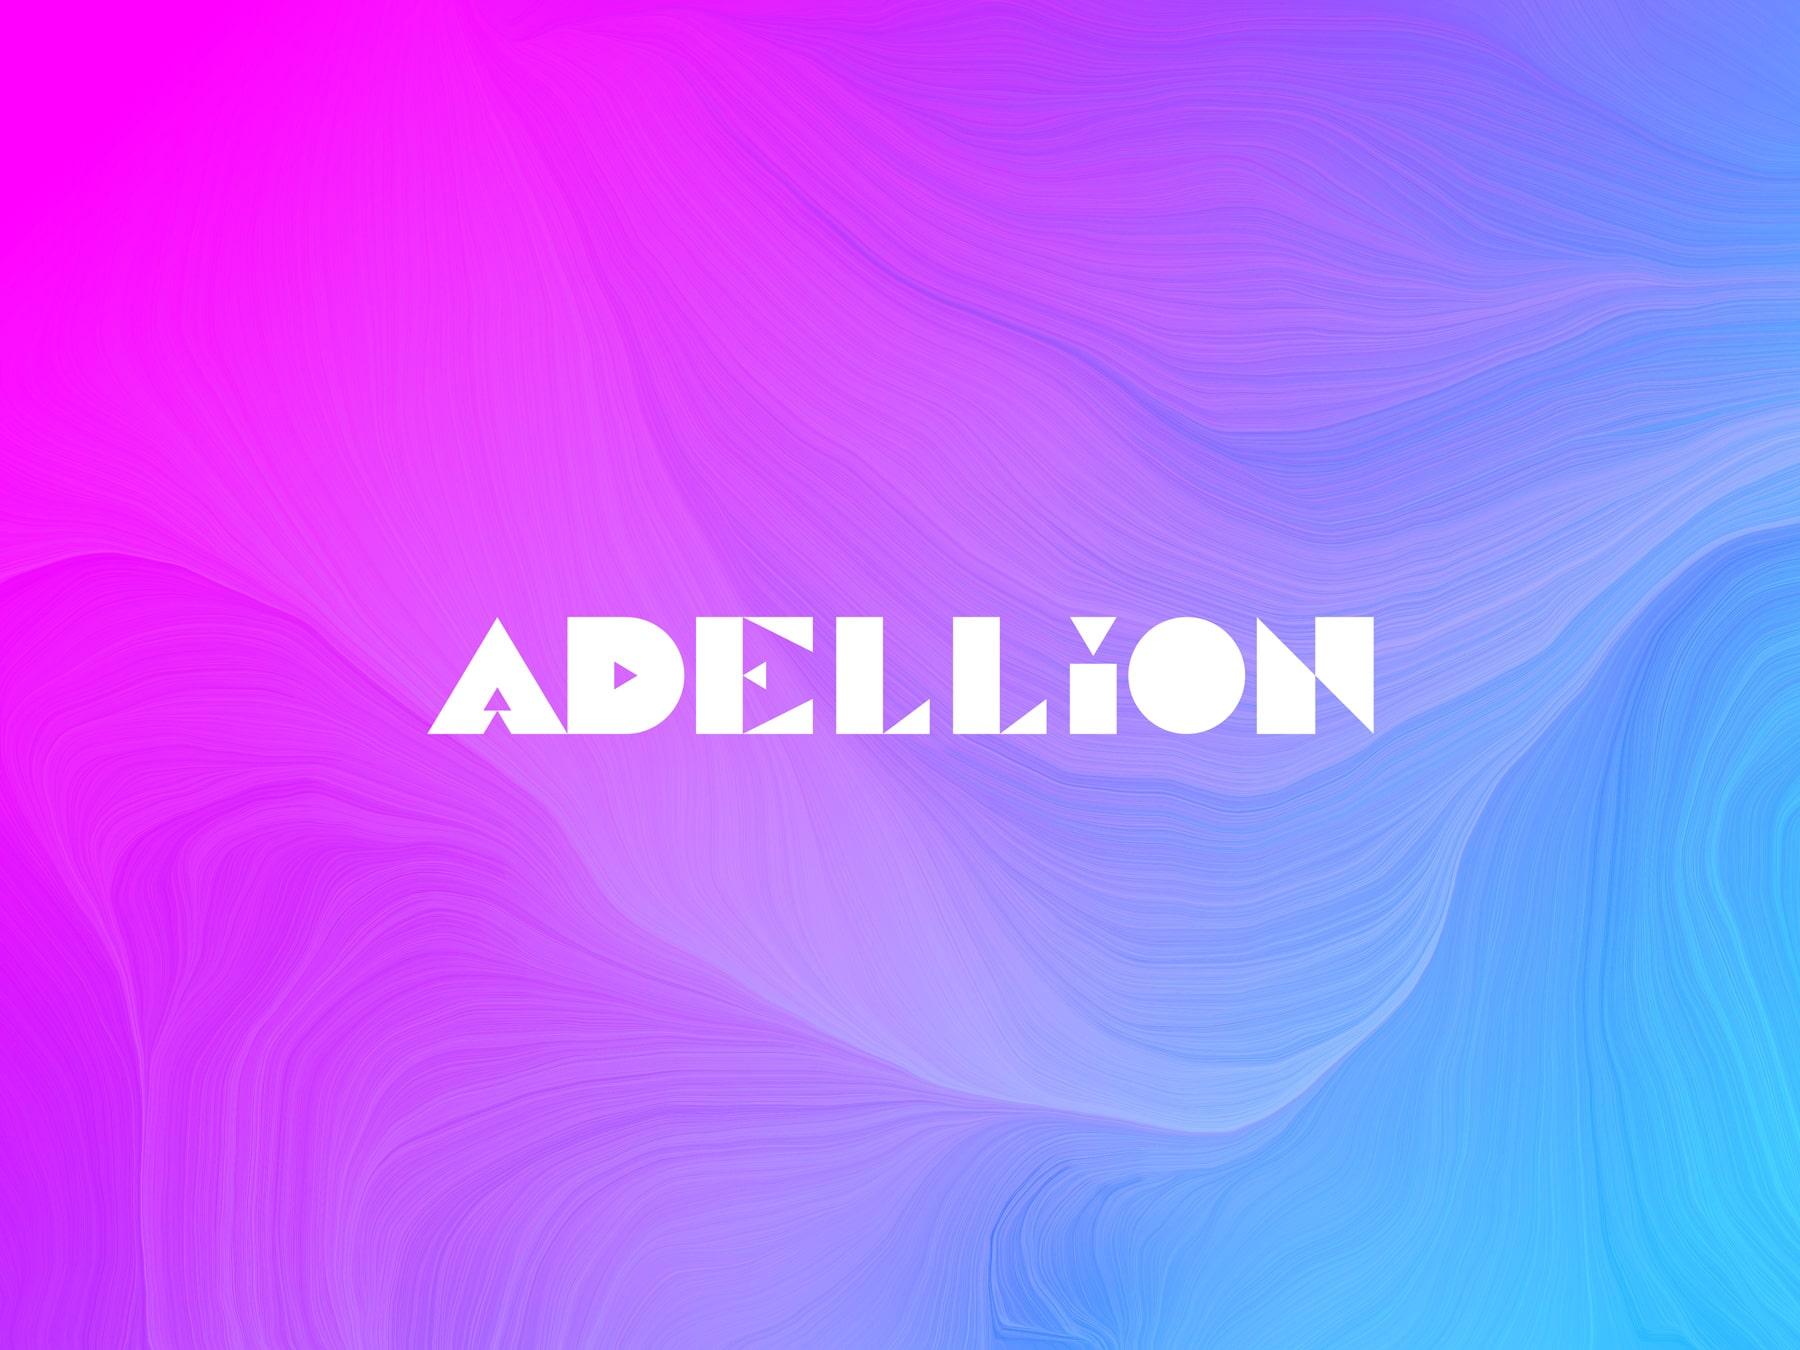 adellion